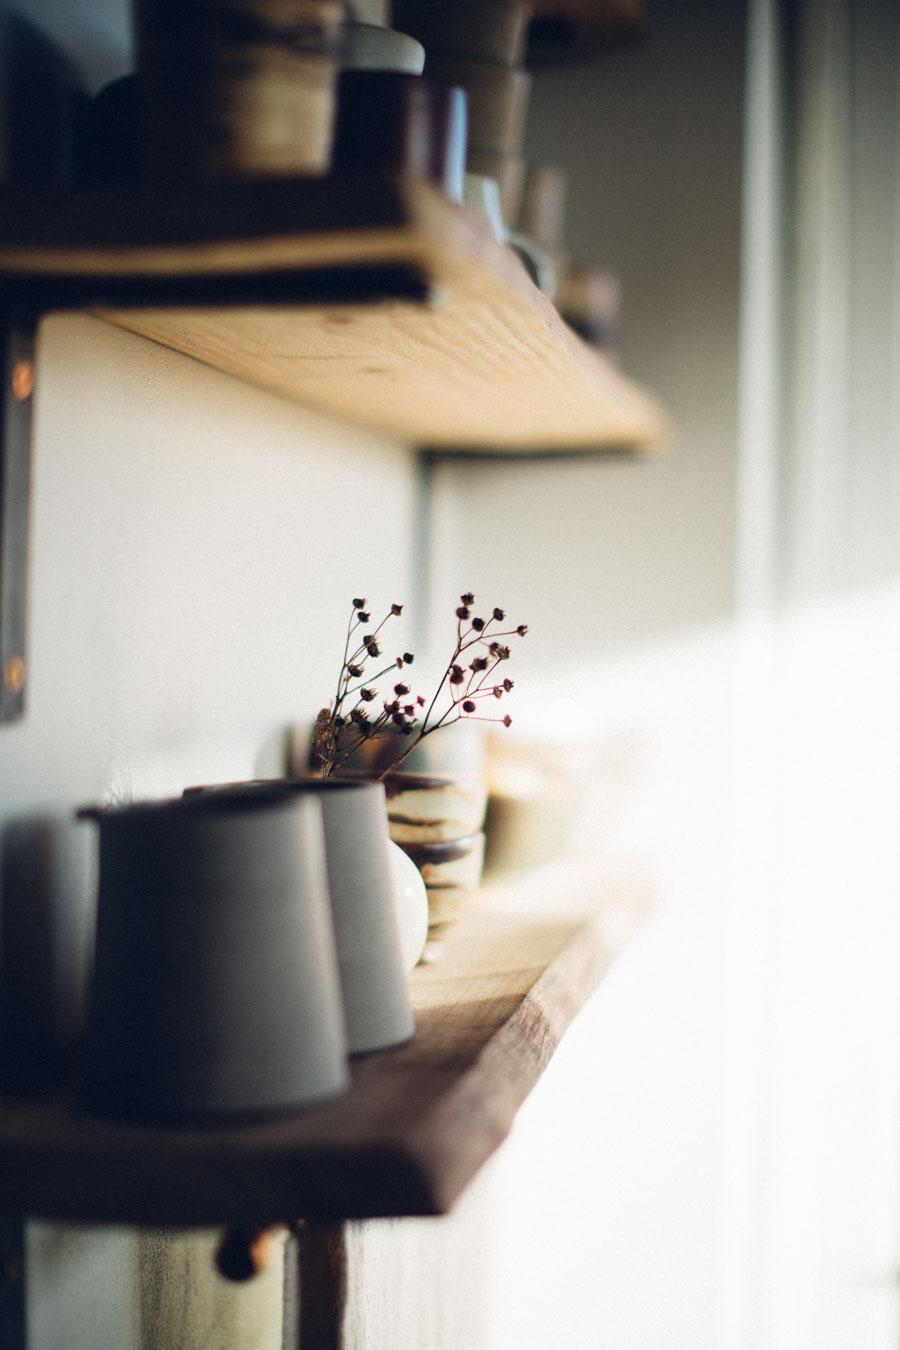 Handmade ceramics on display